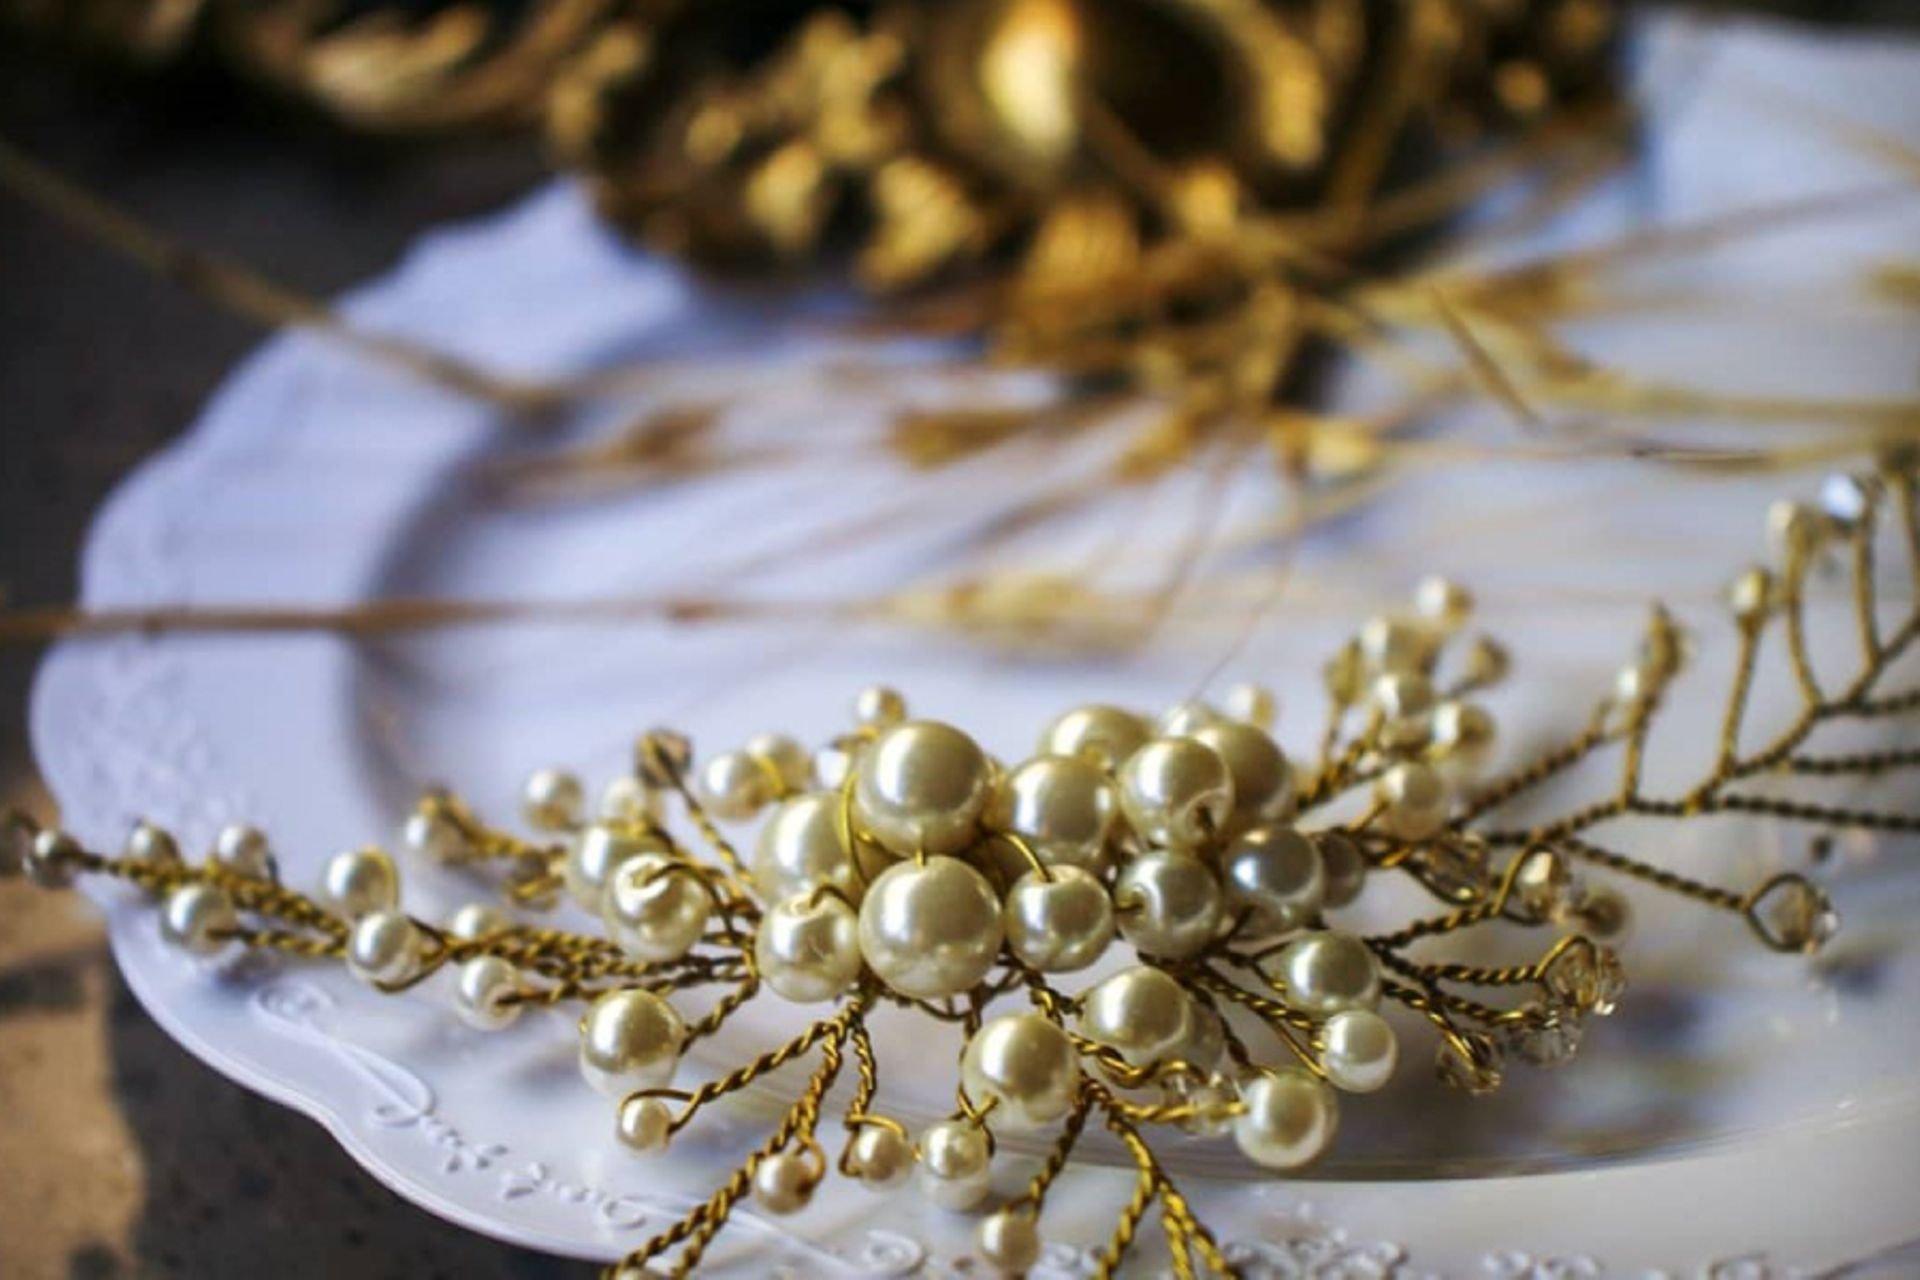 42 lantana beads jewelry designer תְמוּנָה